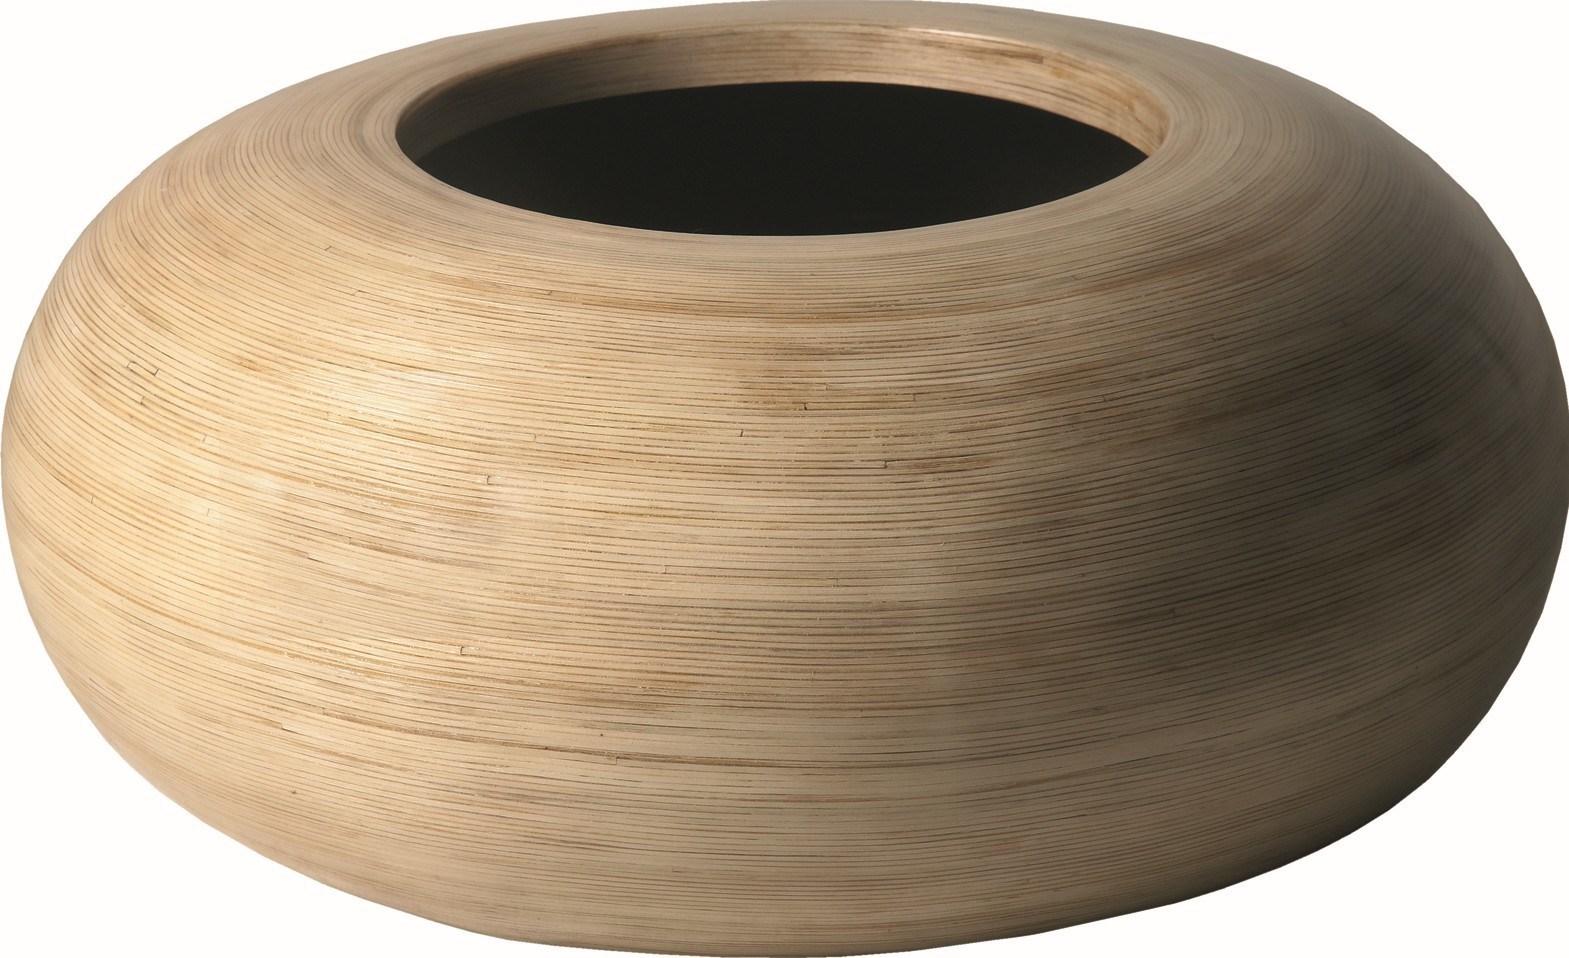 vase donut designer xxl vasen designervasen. Black Bedroom Furniture Sets. Home Design Ideas